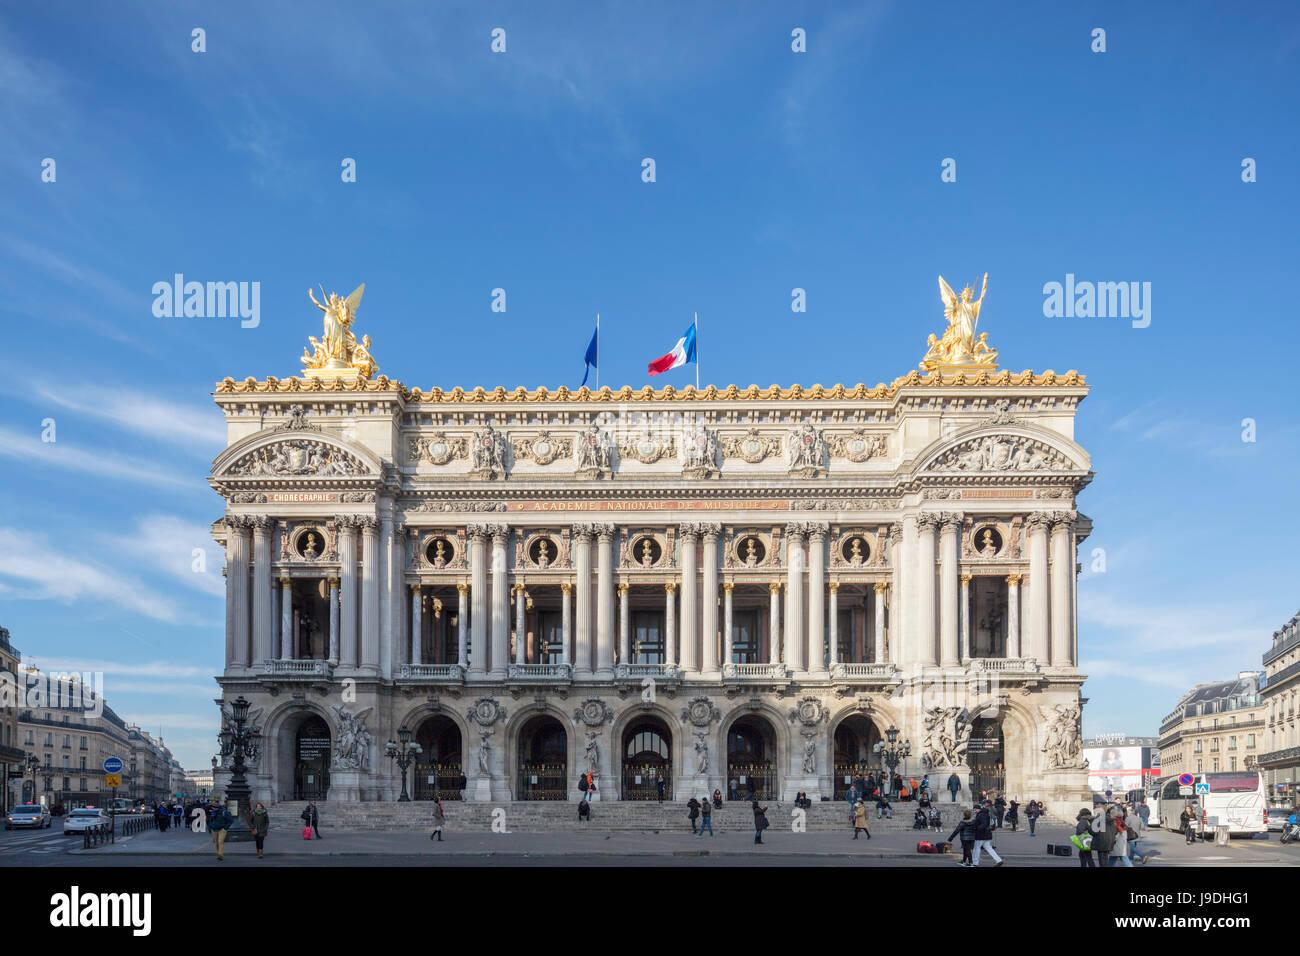 Palais Garnier Opera House, Paris, France - Stock Image